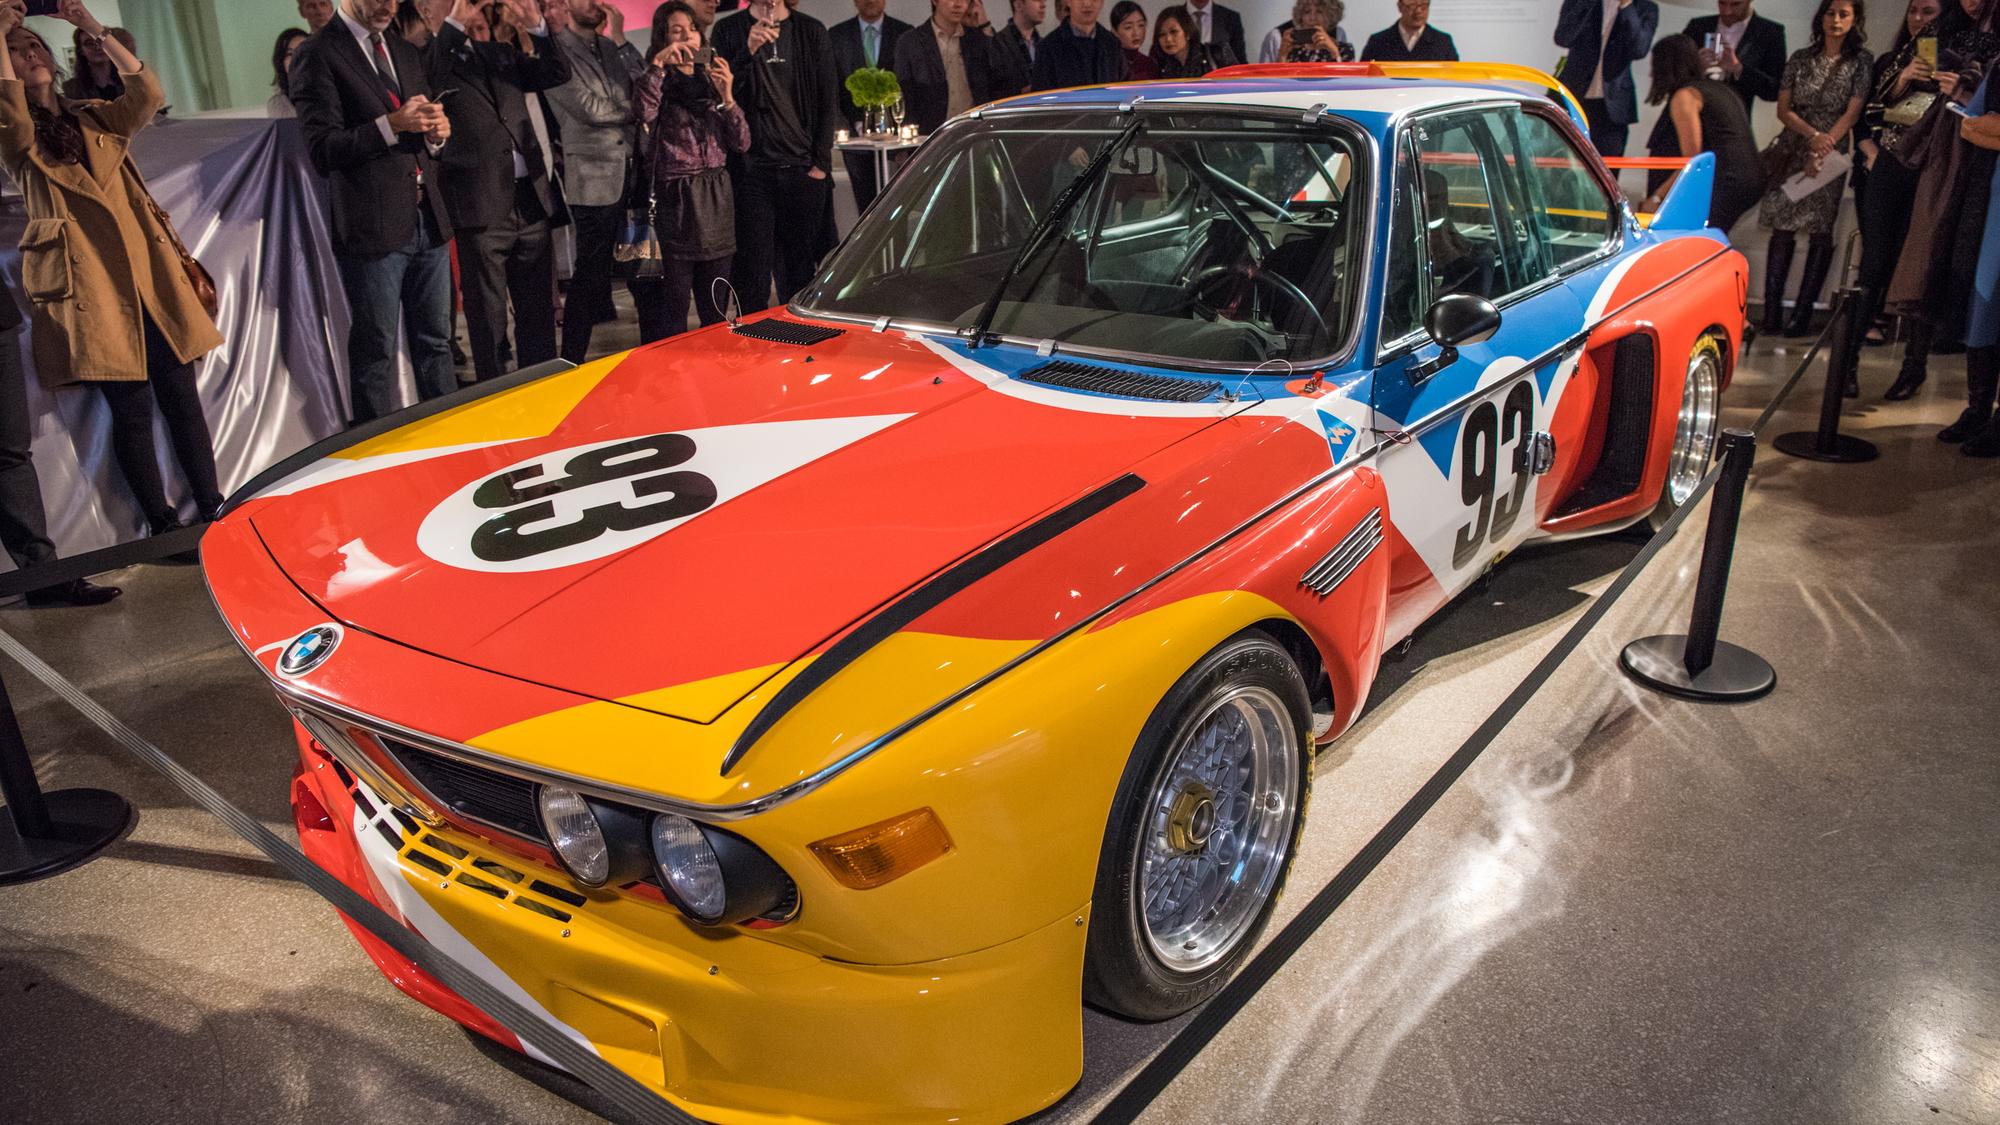 BMW Art Car by Alexander Calder